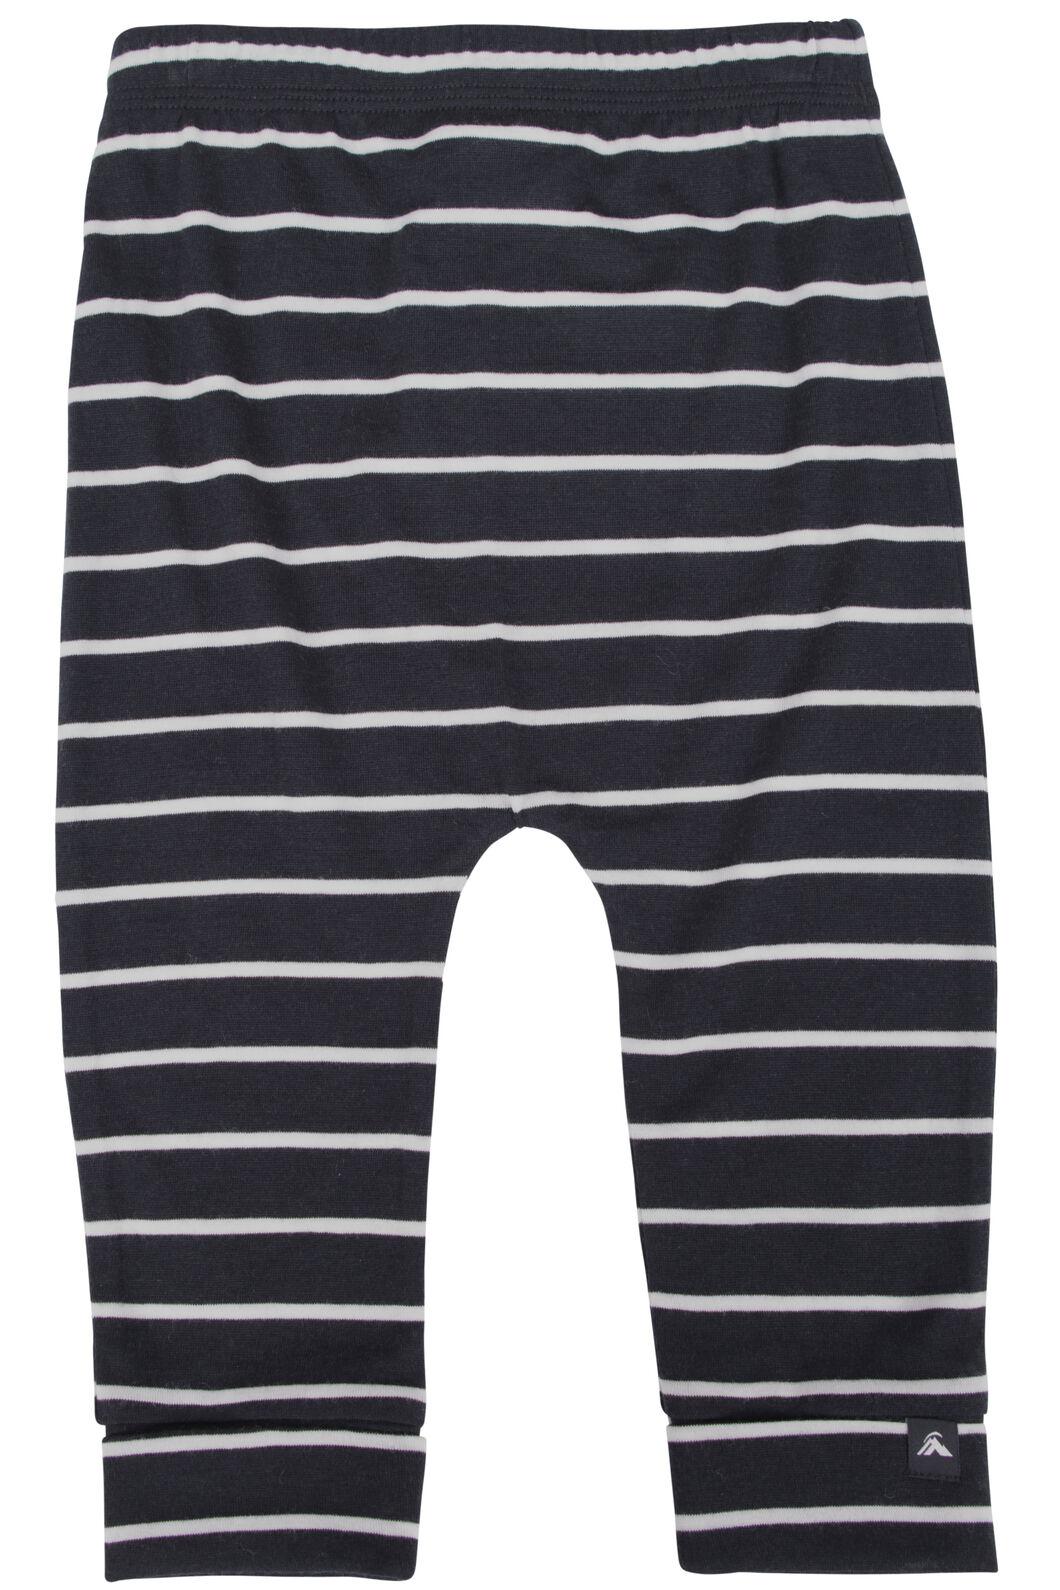 Macpac 150 Merino Long Johns - Baby, Black/White Stripe, hi-res